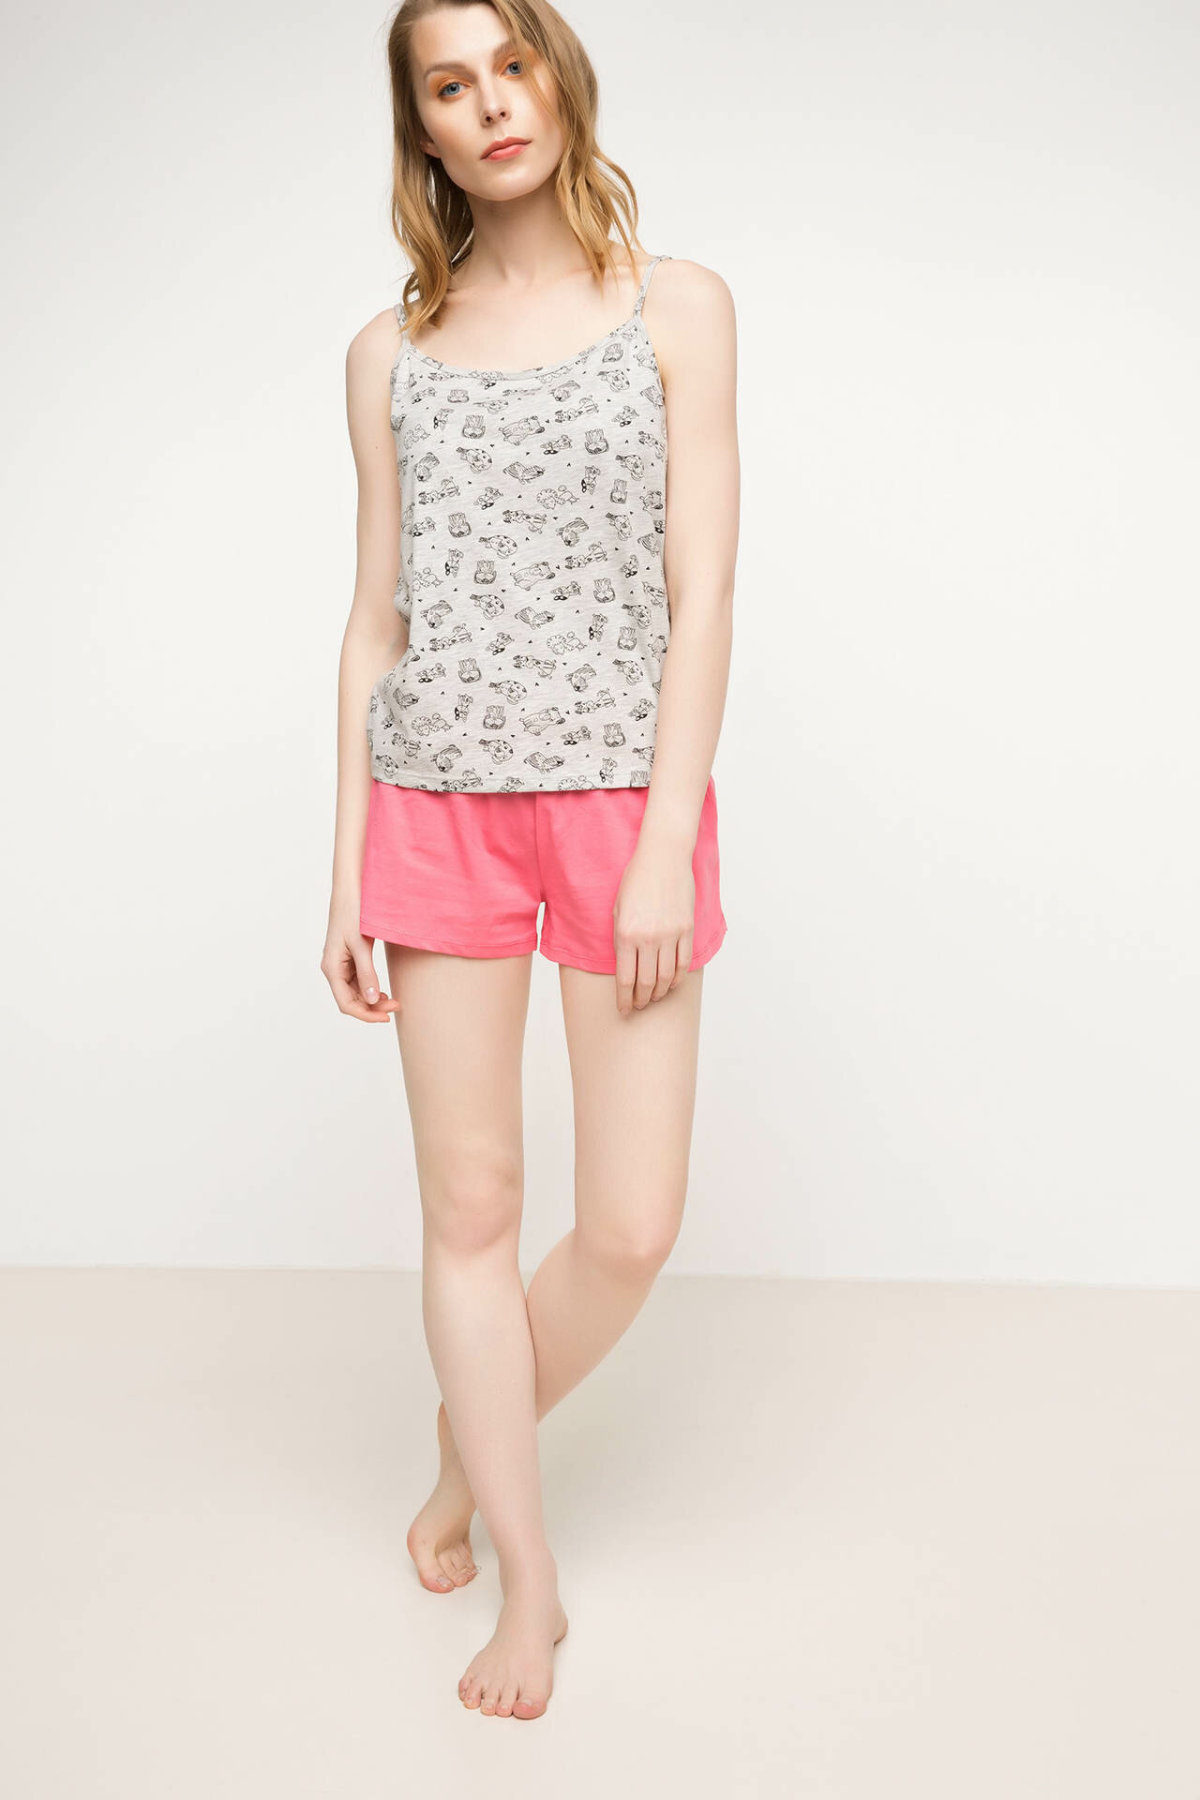 DeFacto Fashion Woman Knitted Sets Female Casual Print Sling Tank Shorts Sets High Quality Tops Short Pants New - H0982AZ17SM